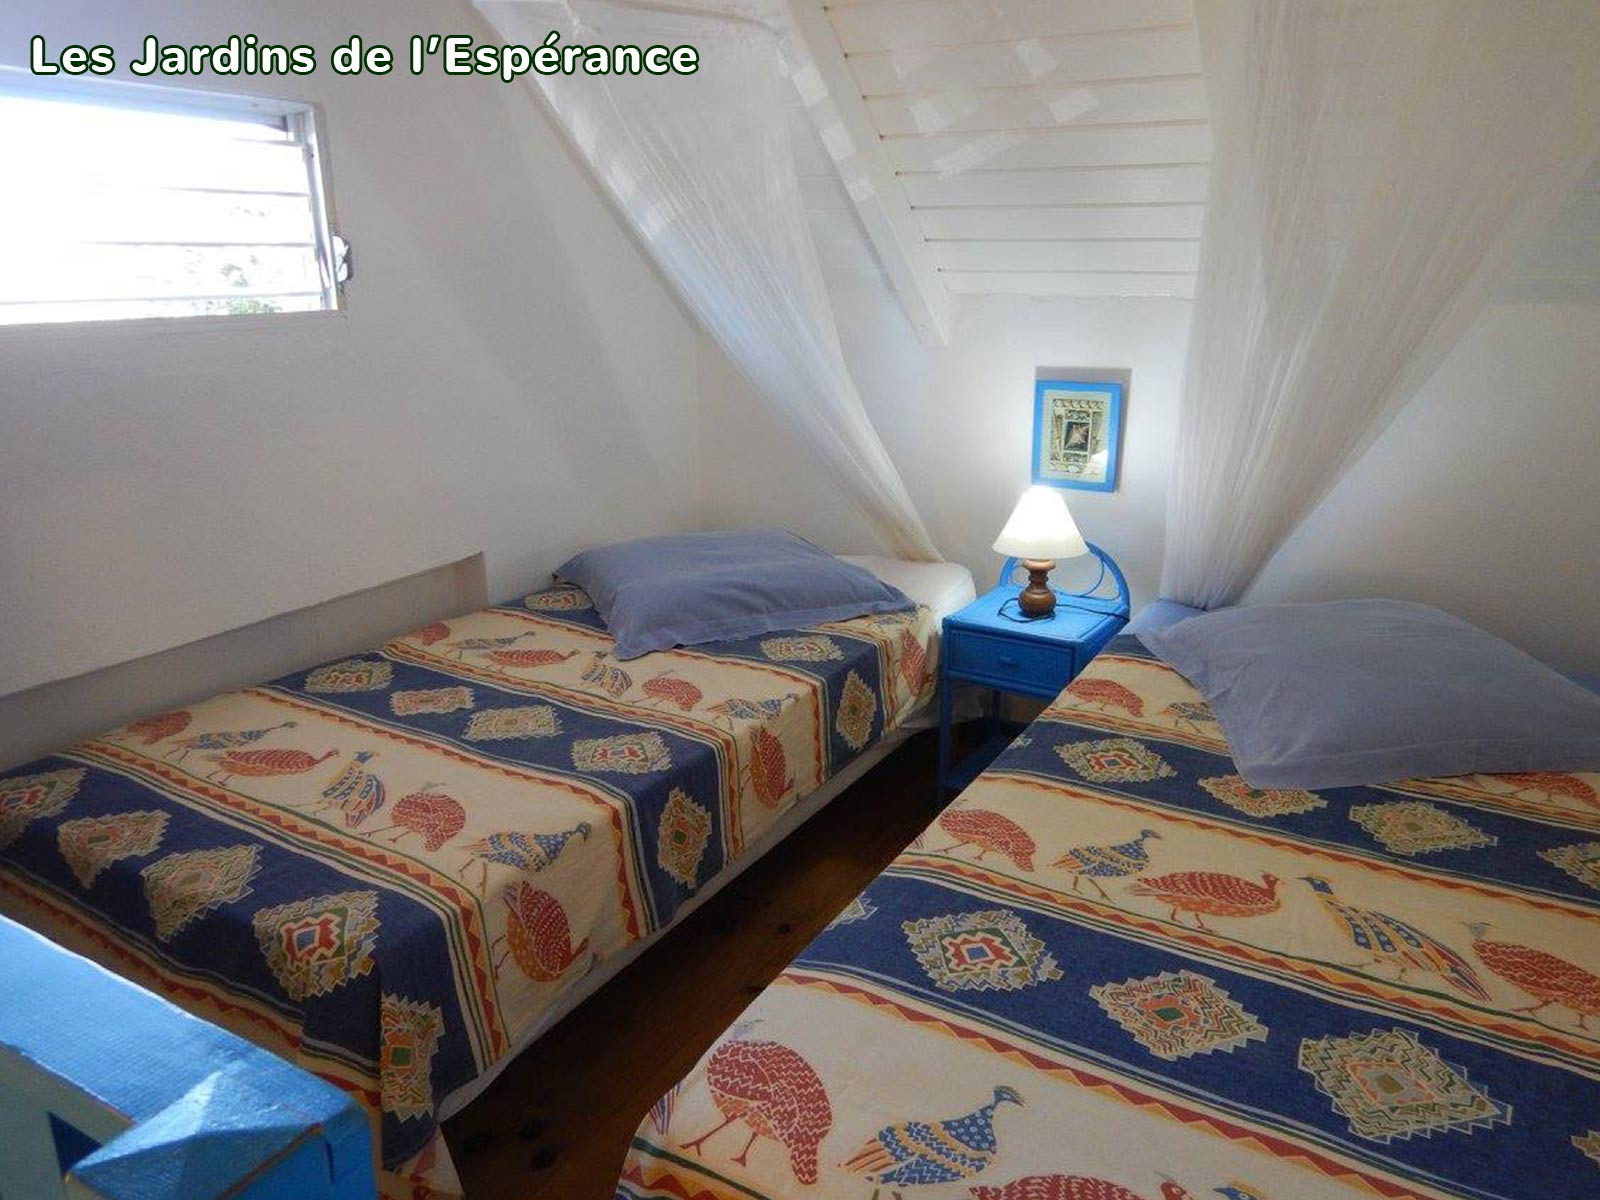 Les Jardins de l'Espérance - Chambre deux lits